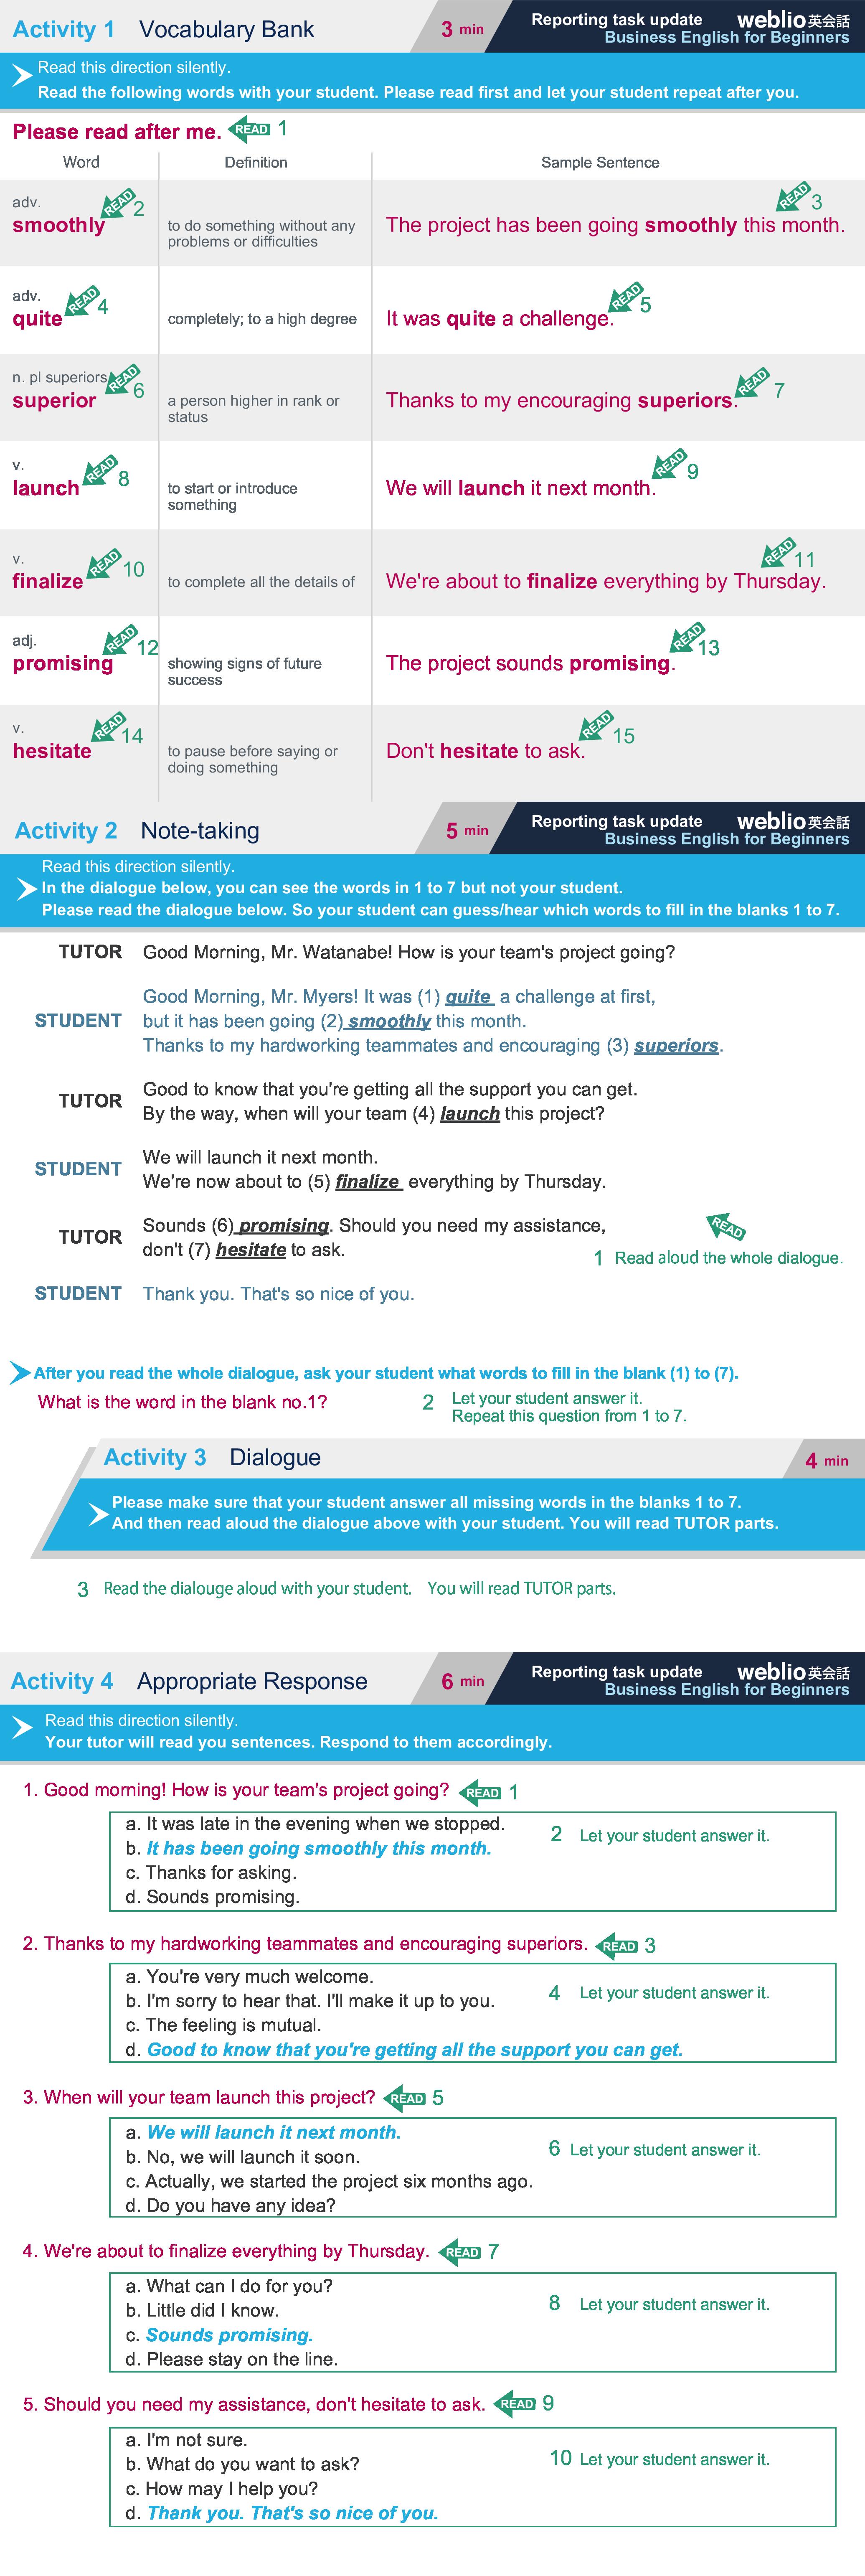 business-beginner,business-basics-reporting-task-update-tutors-copy